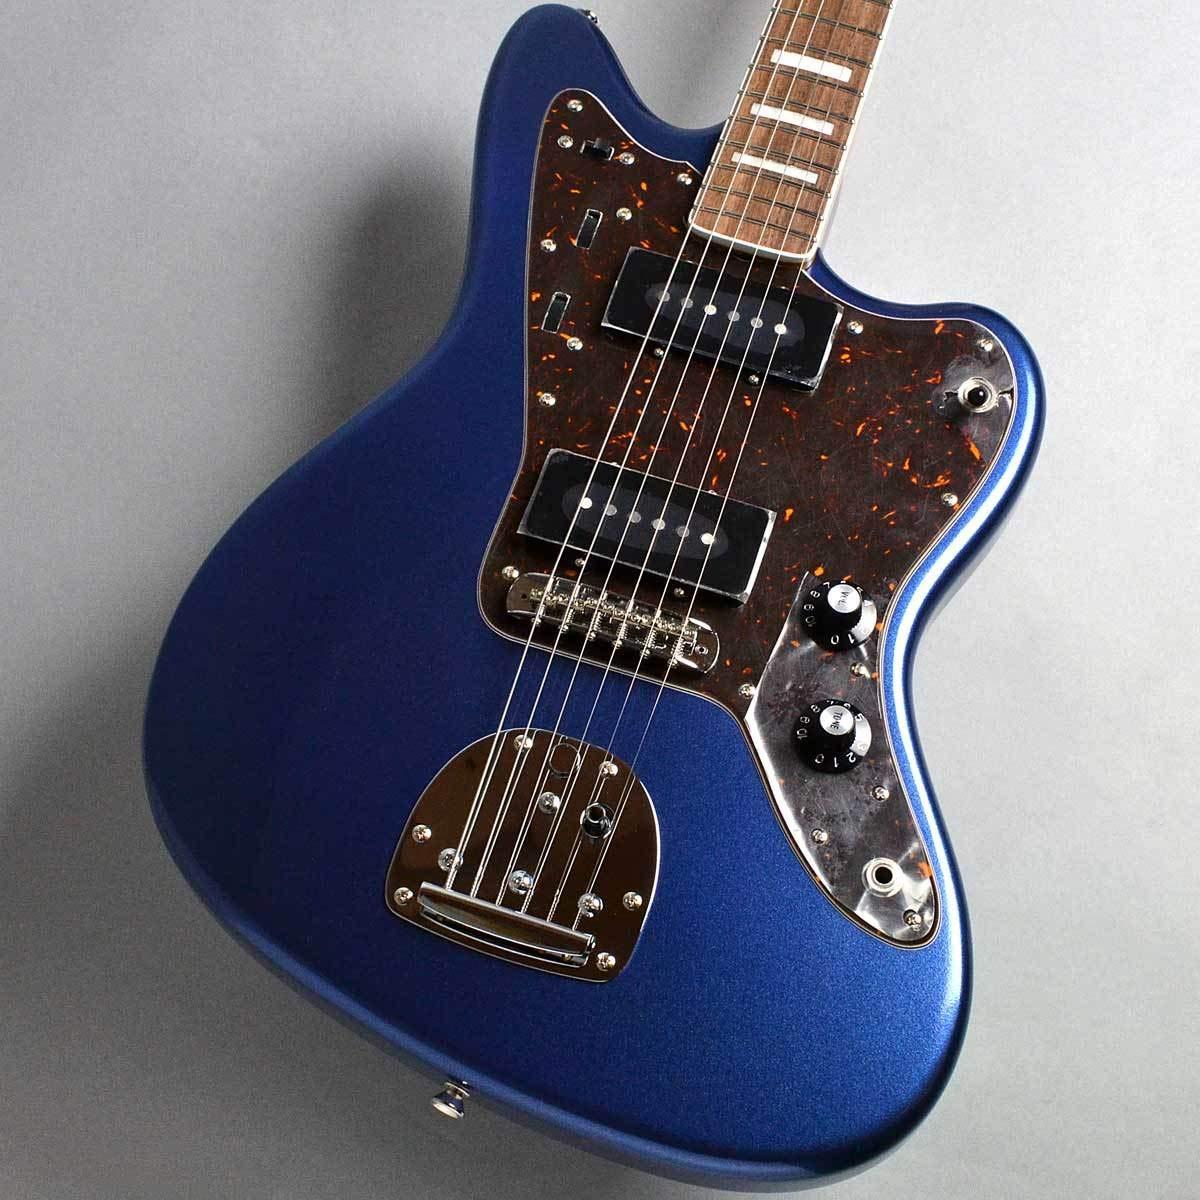 moon B07MJFPYWG ムーン moon JM-Limited/Lake Placid Blue エレキギター ムーン B07MJFPYWG, あいる:5b1807d2 --- kapapa.site